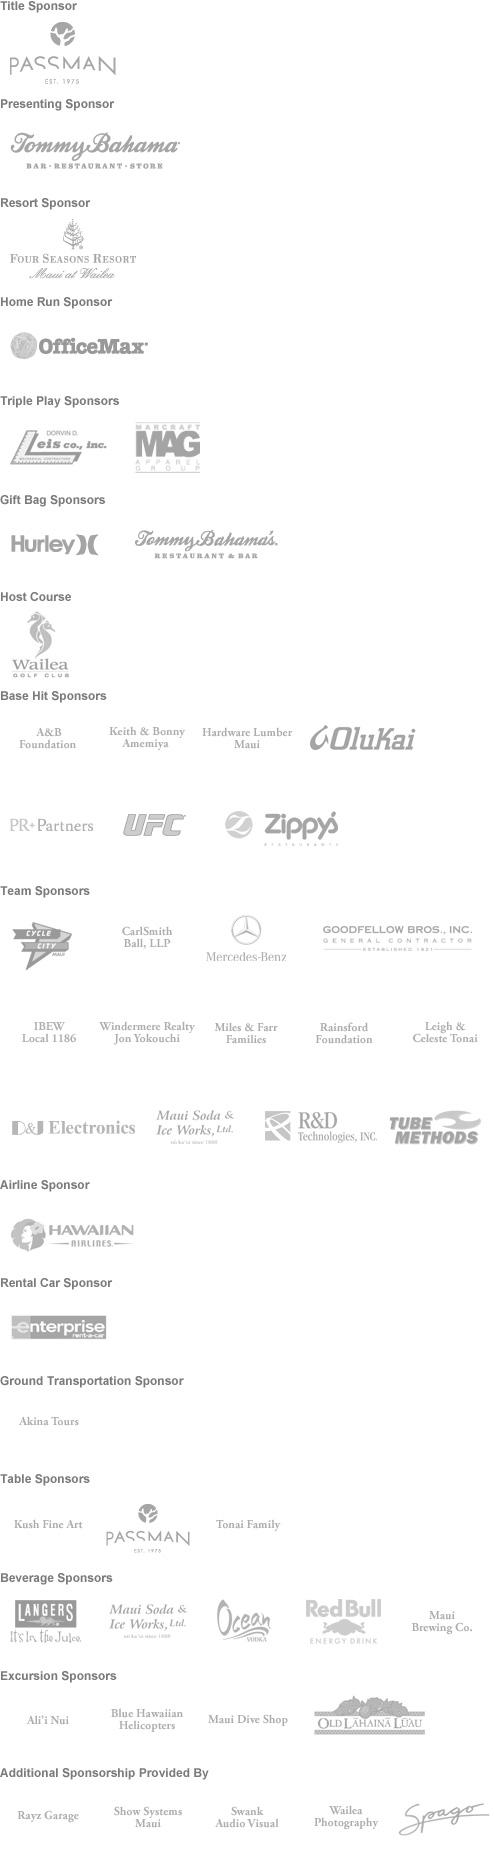 Shane Victorino Foundation - Golf Logos